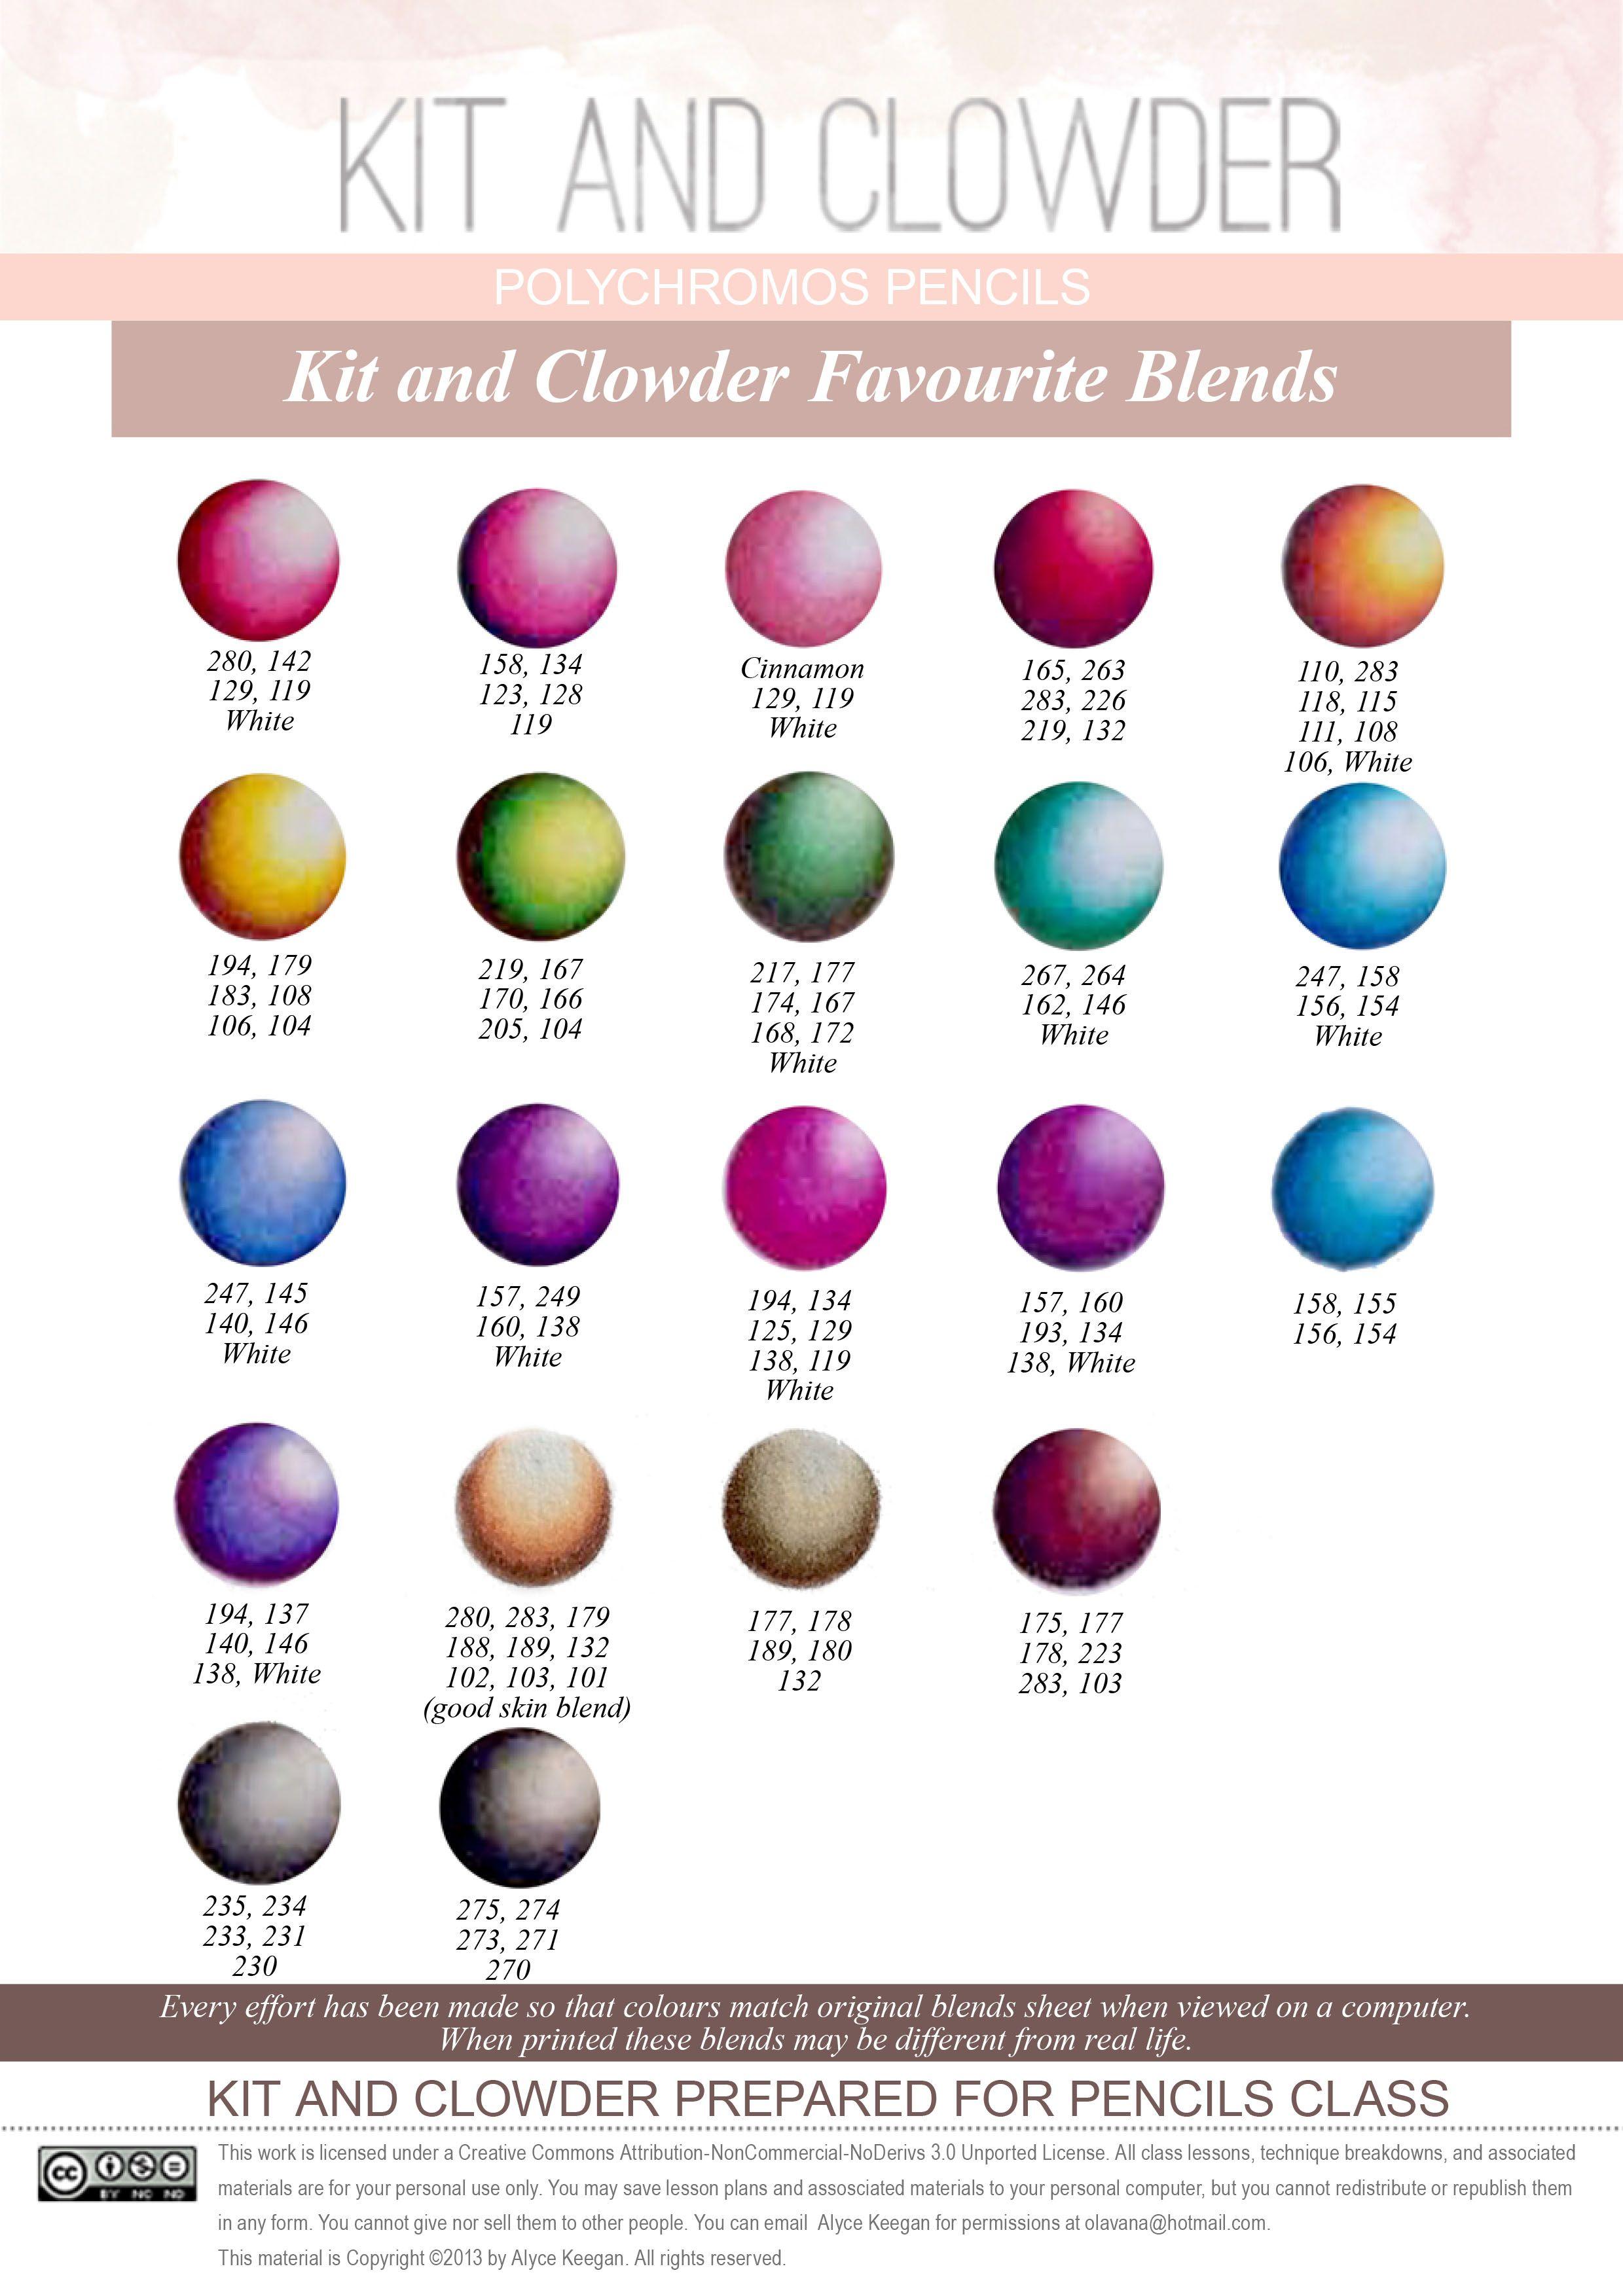 Game maker color blend - Polychromos Favorite Colored Pencil Blends Kit And Clowder